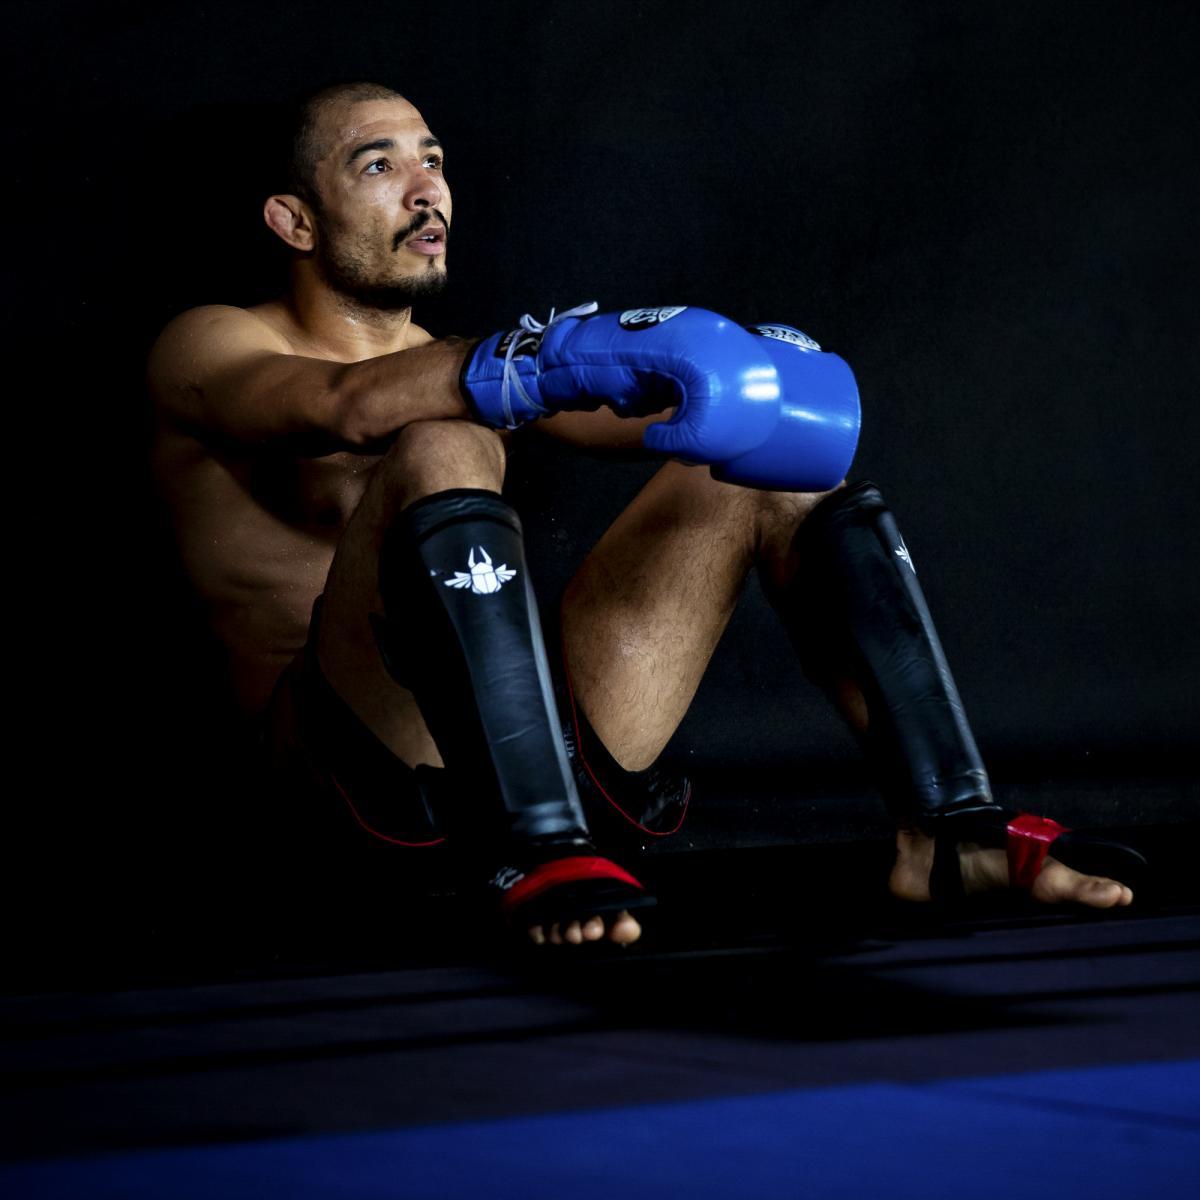 Timeline Of Jose Aldo's Decline From UFC Superstar To